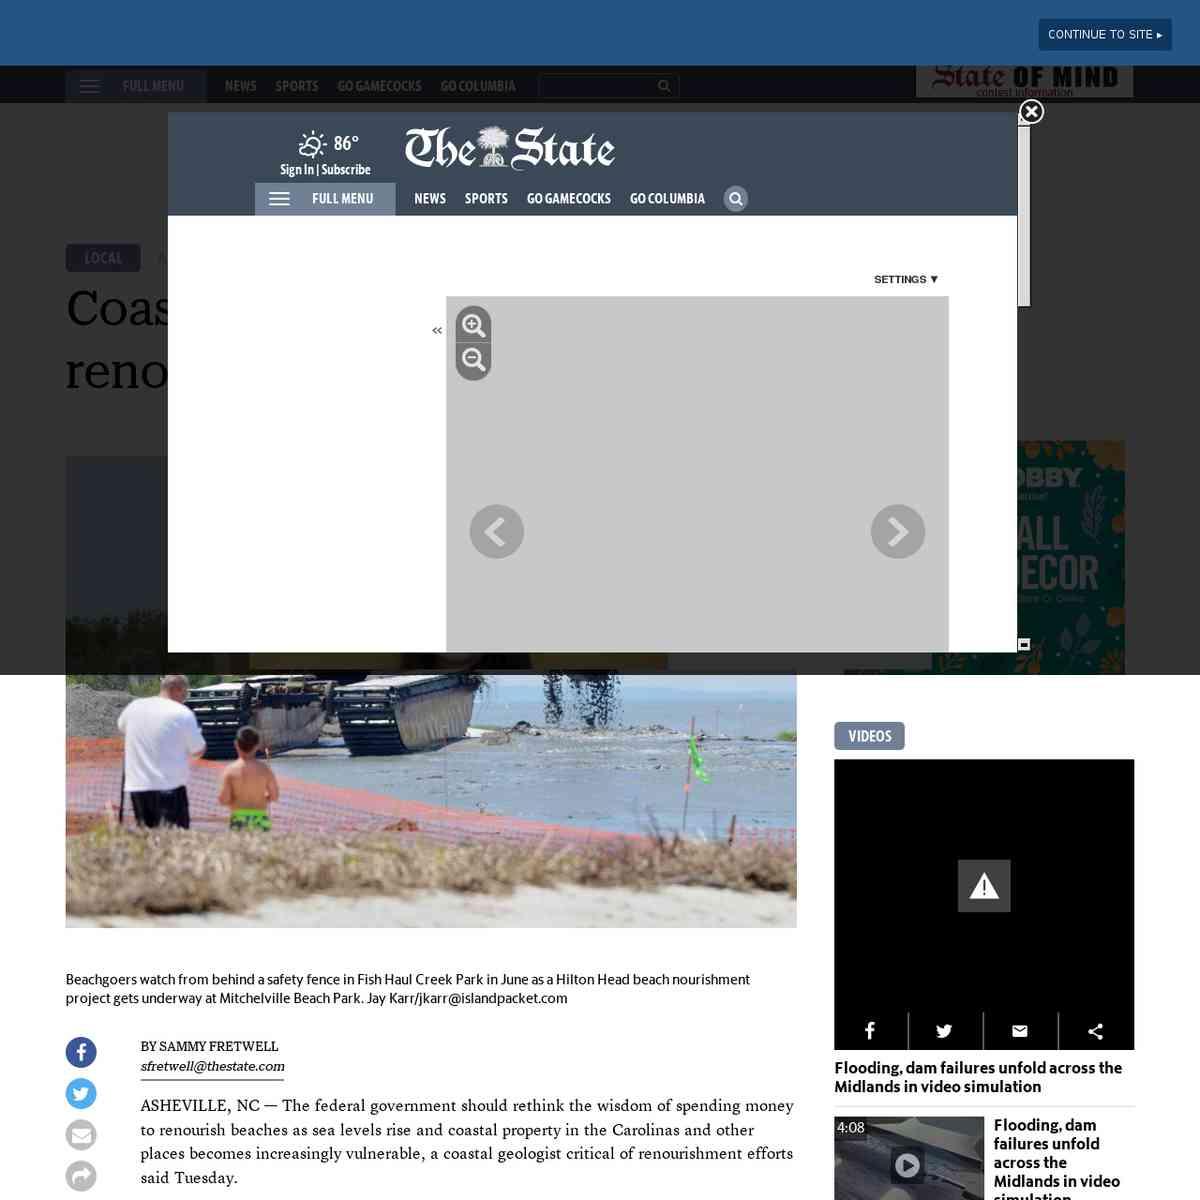 Coastal geologist criticizes beach renourishment efforts, including in SC